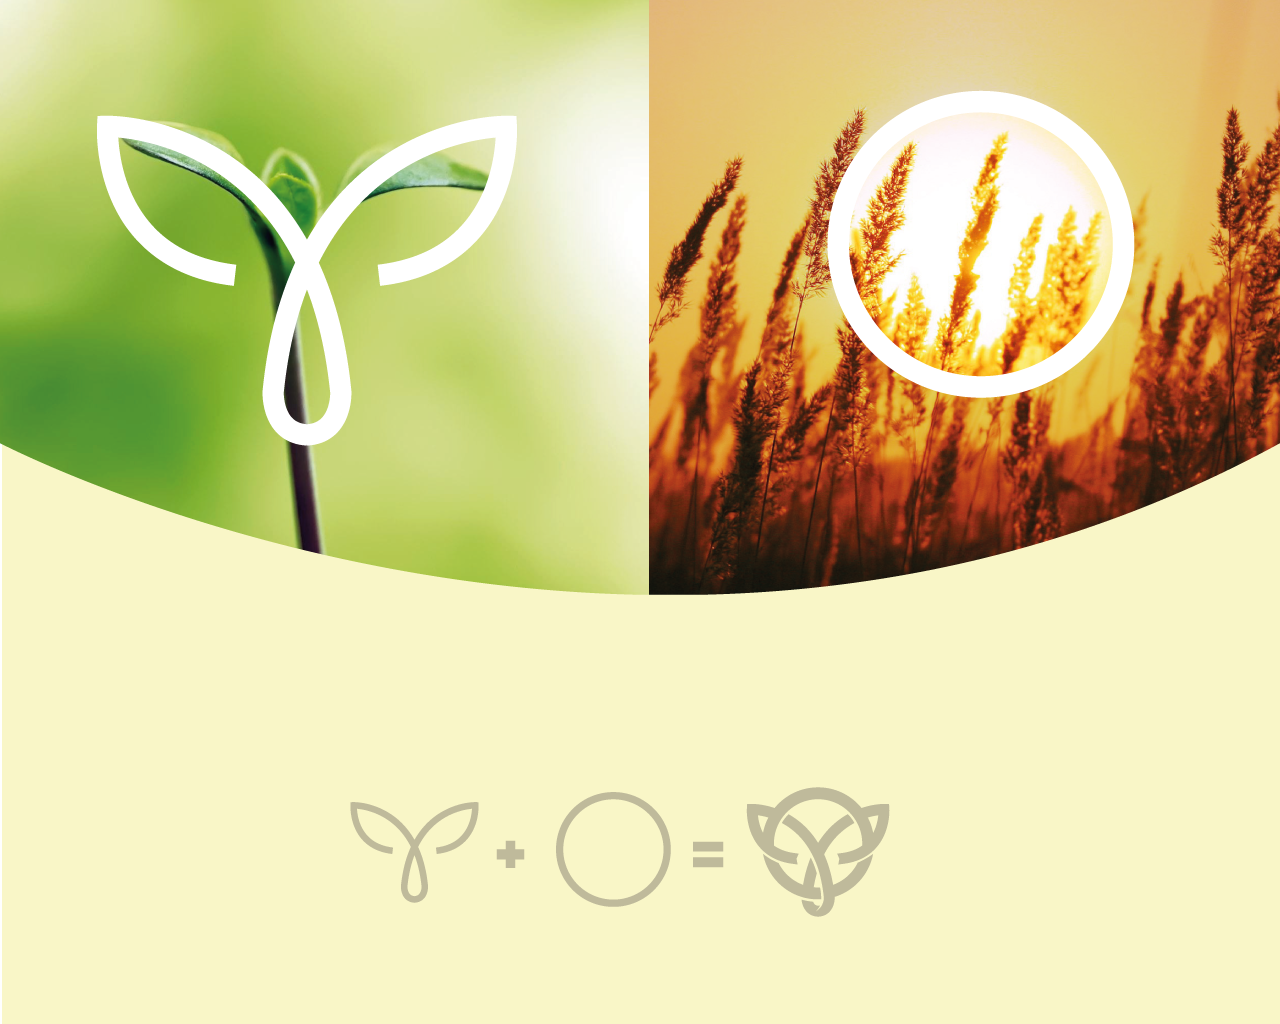 Логотип и фирменный стиль фото f_47159510eddd5fbe.png